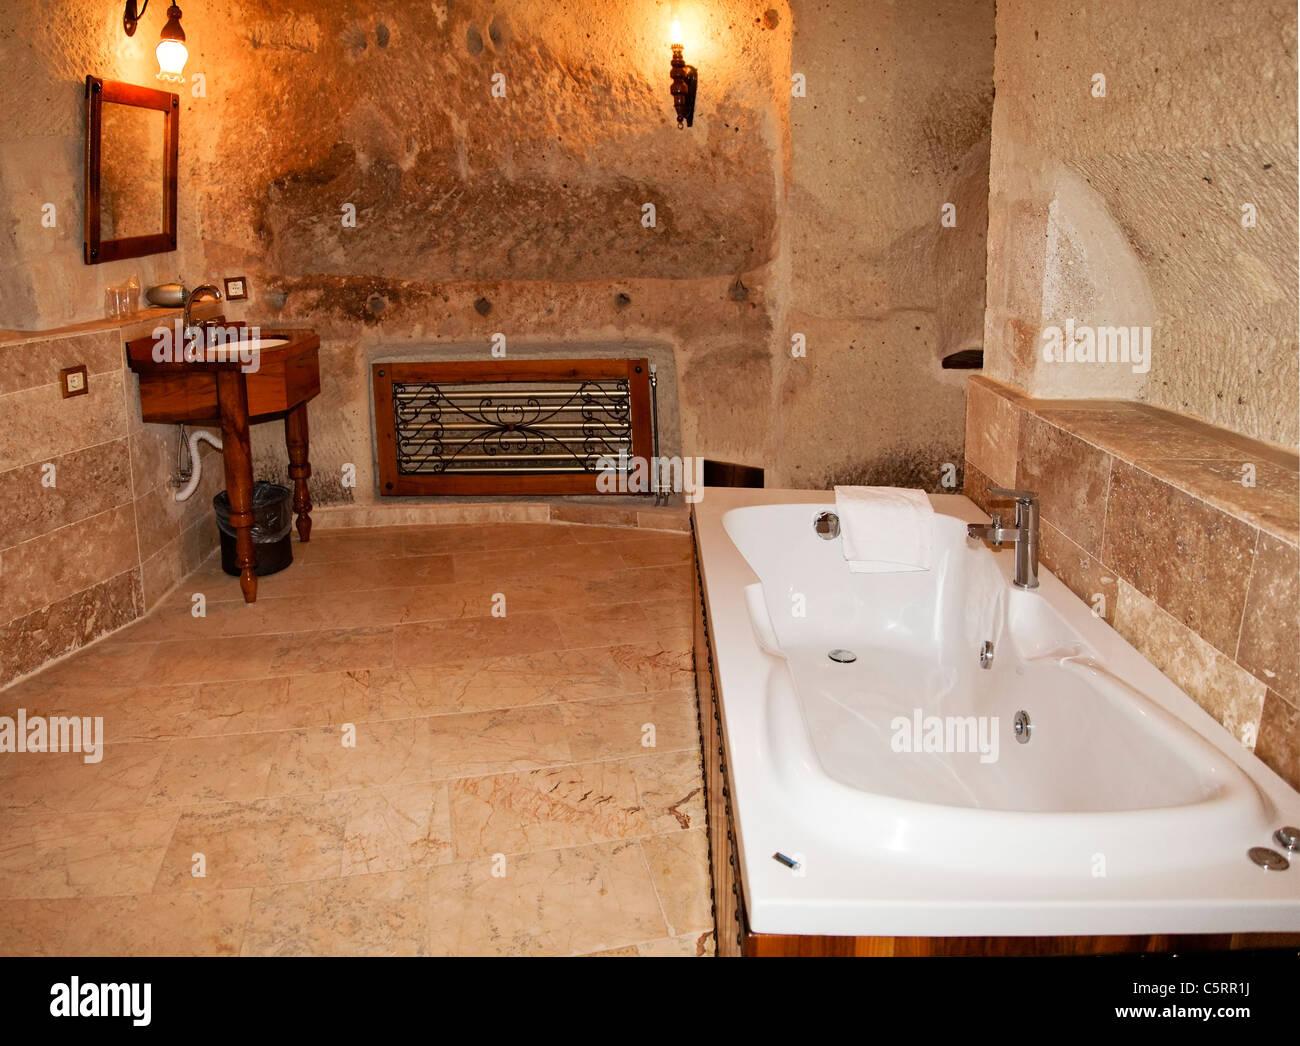 renovation of a bathroom with bathtub, marble floor, limestone walls ...